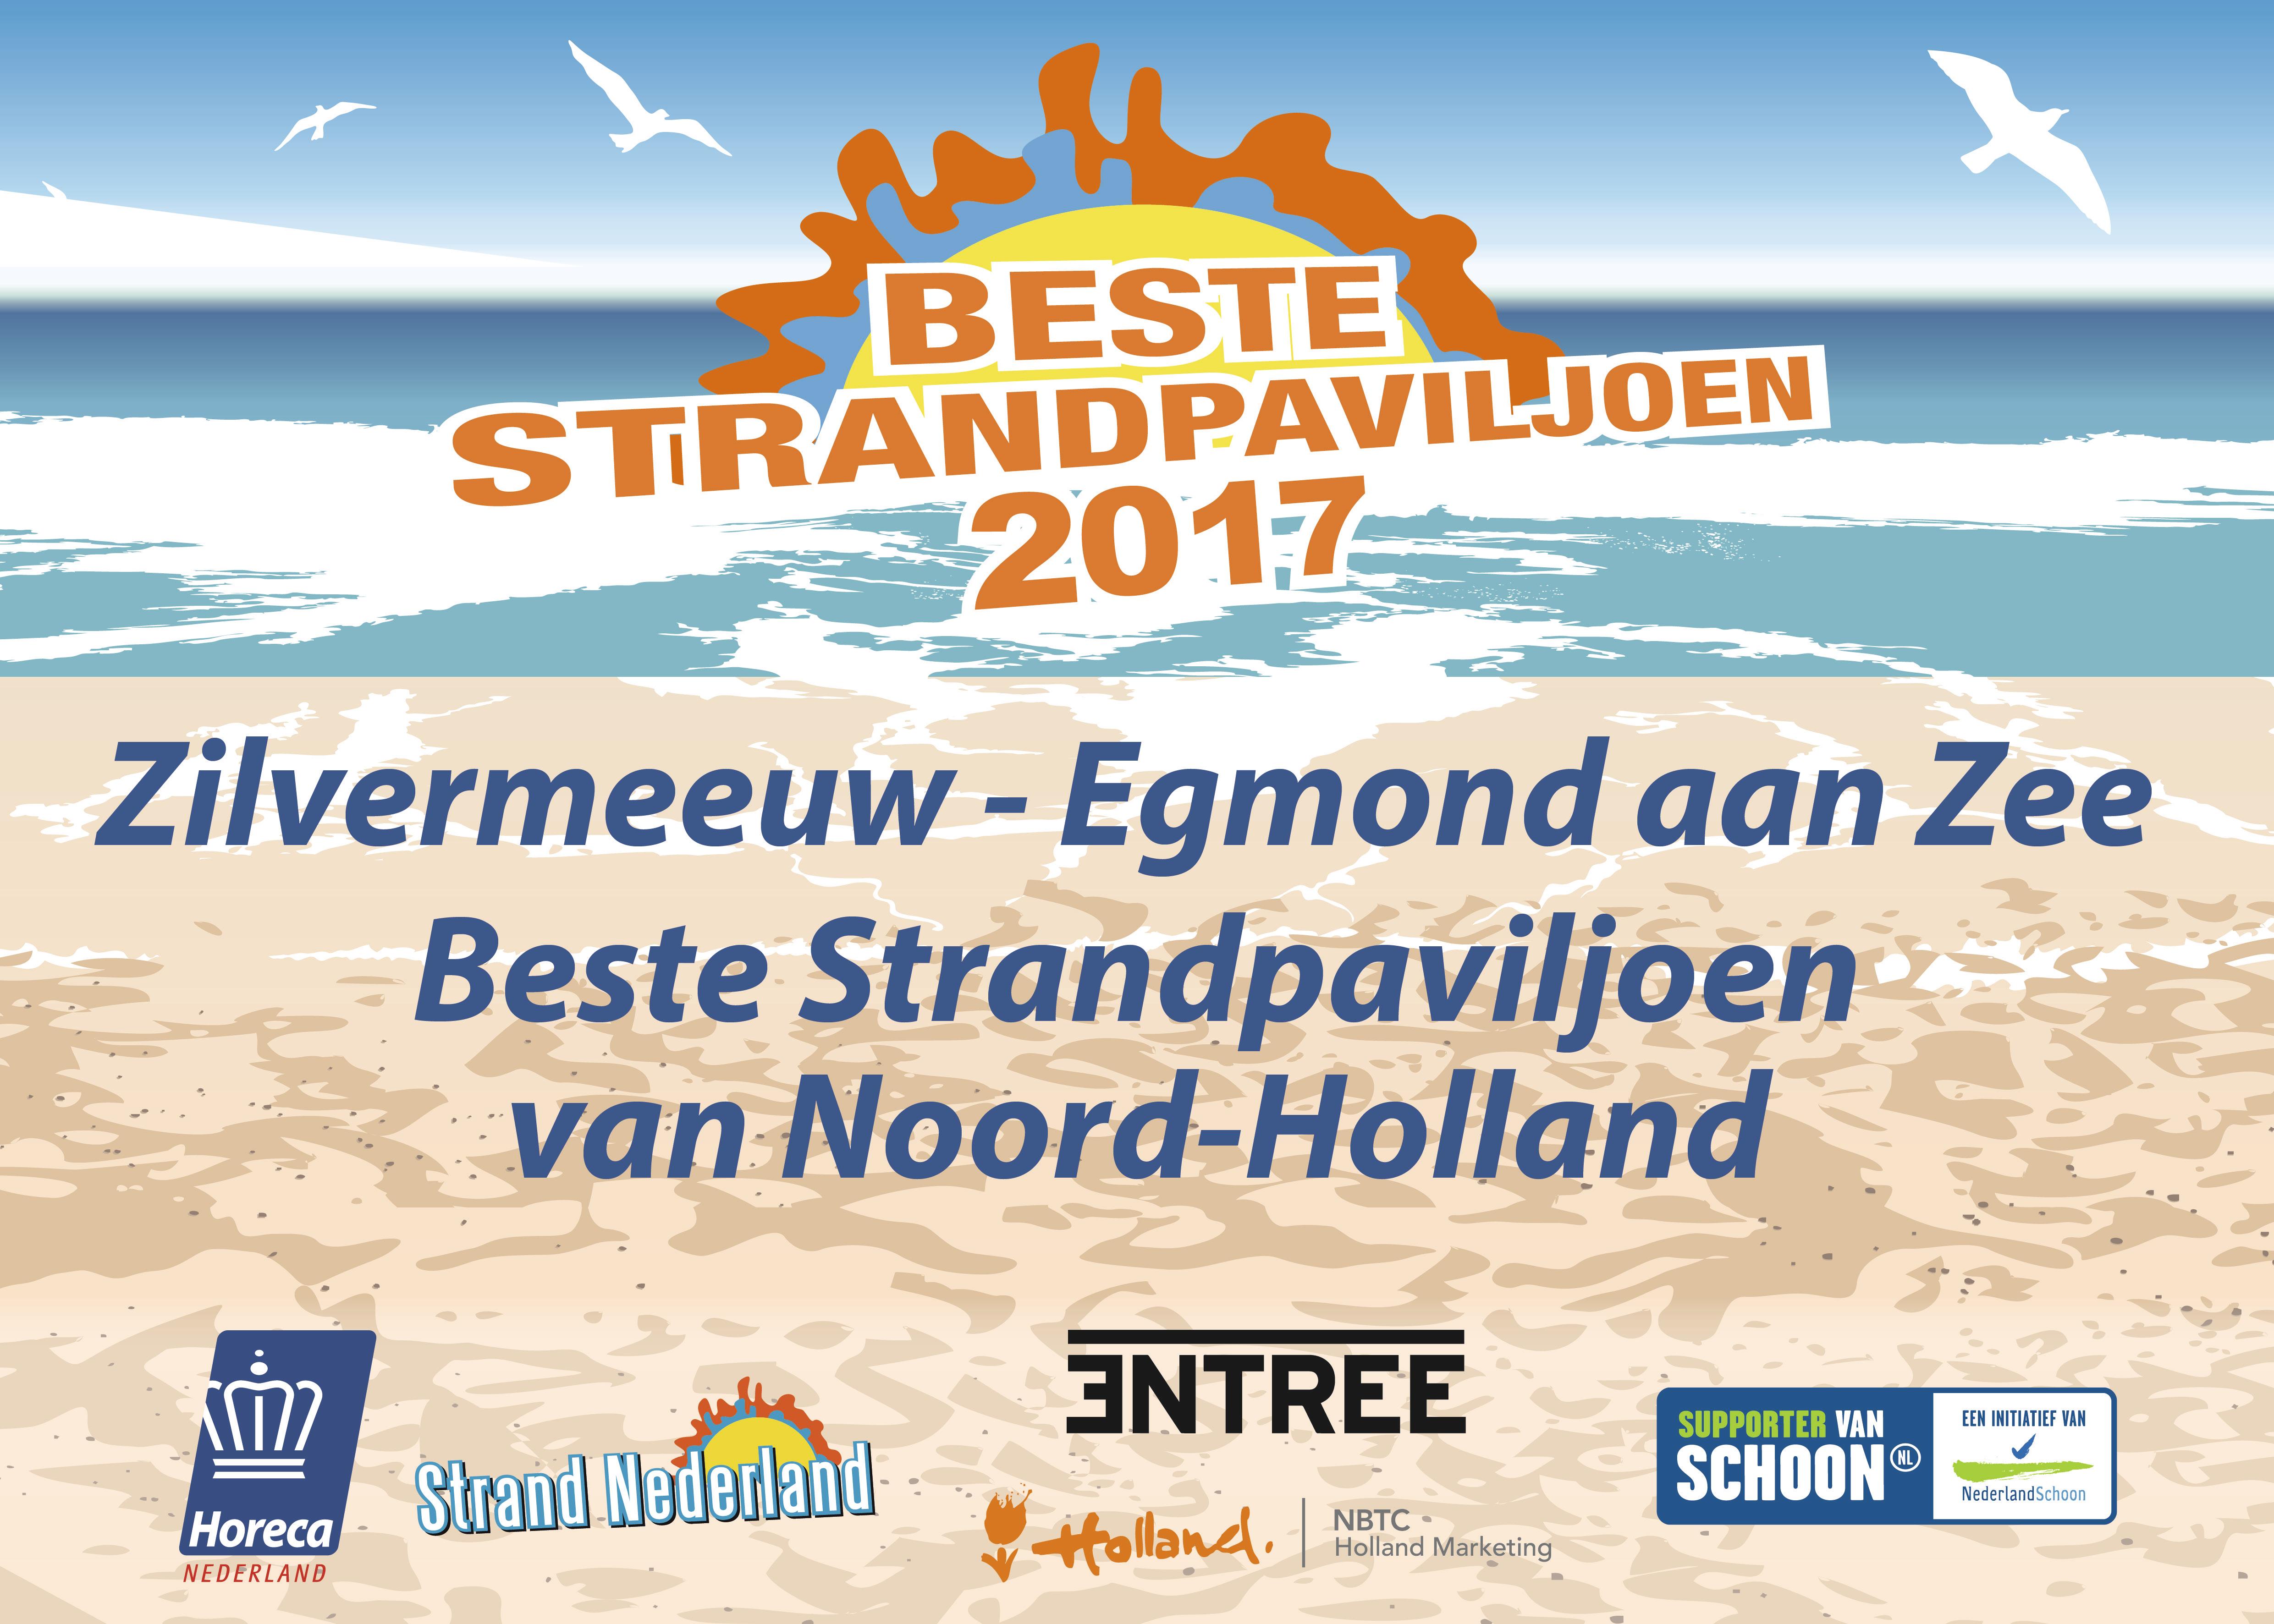 Beste Strandpaviljoen van Noord-Holland